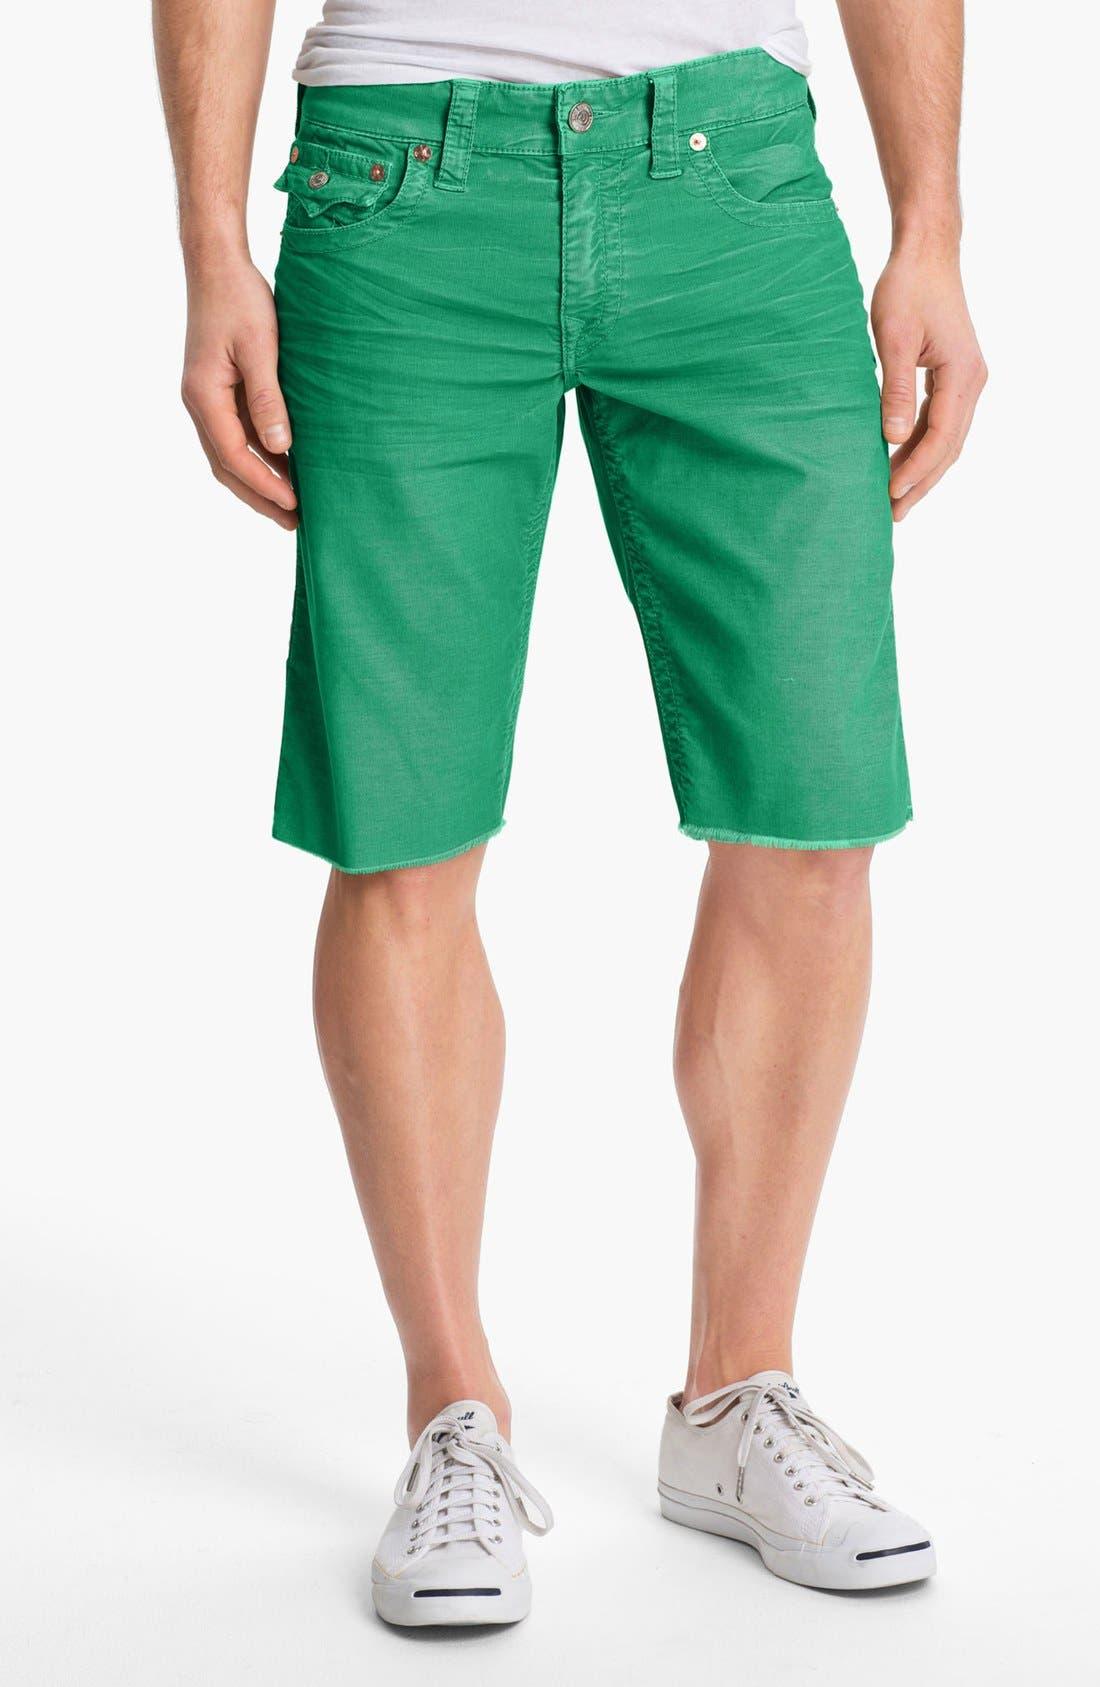 Alternate Image 1 Selected - True Religion Brand Jeans 'Ricky' Cutoff Corduroy Shorts